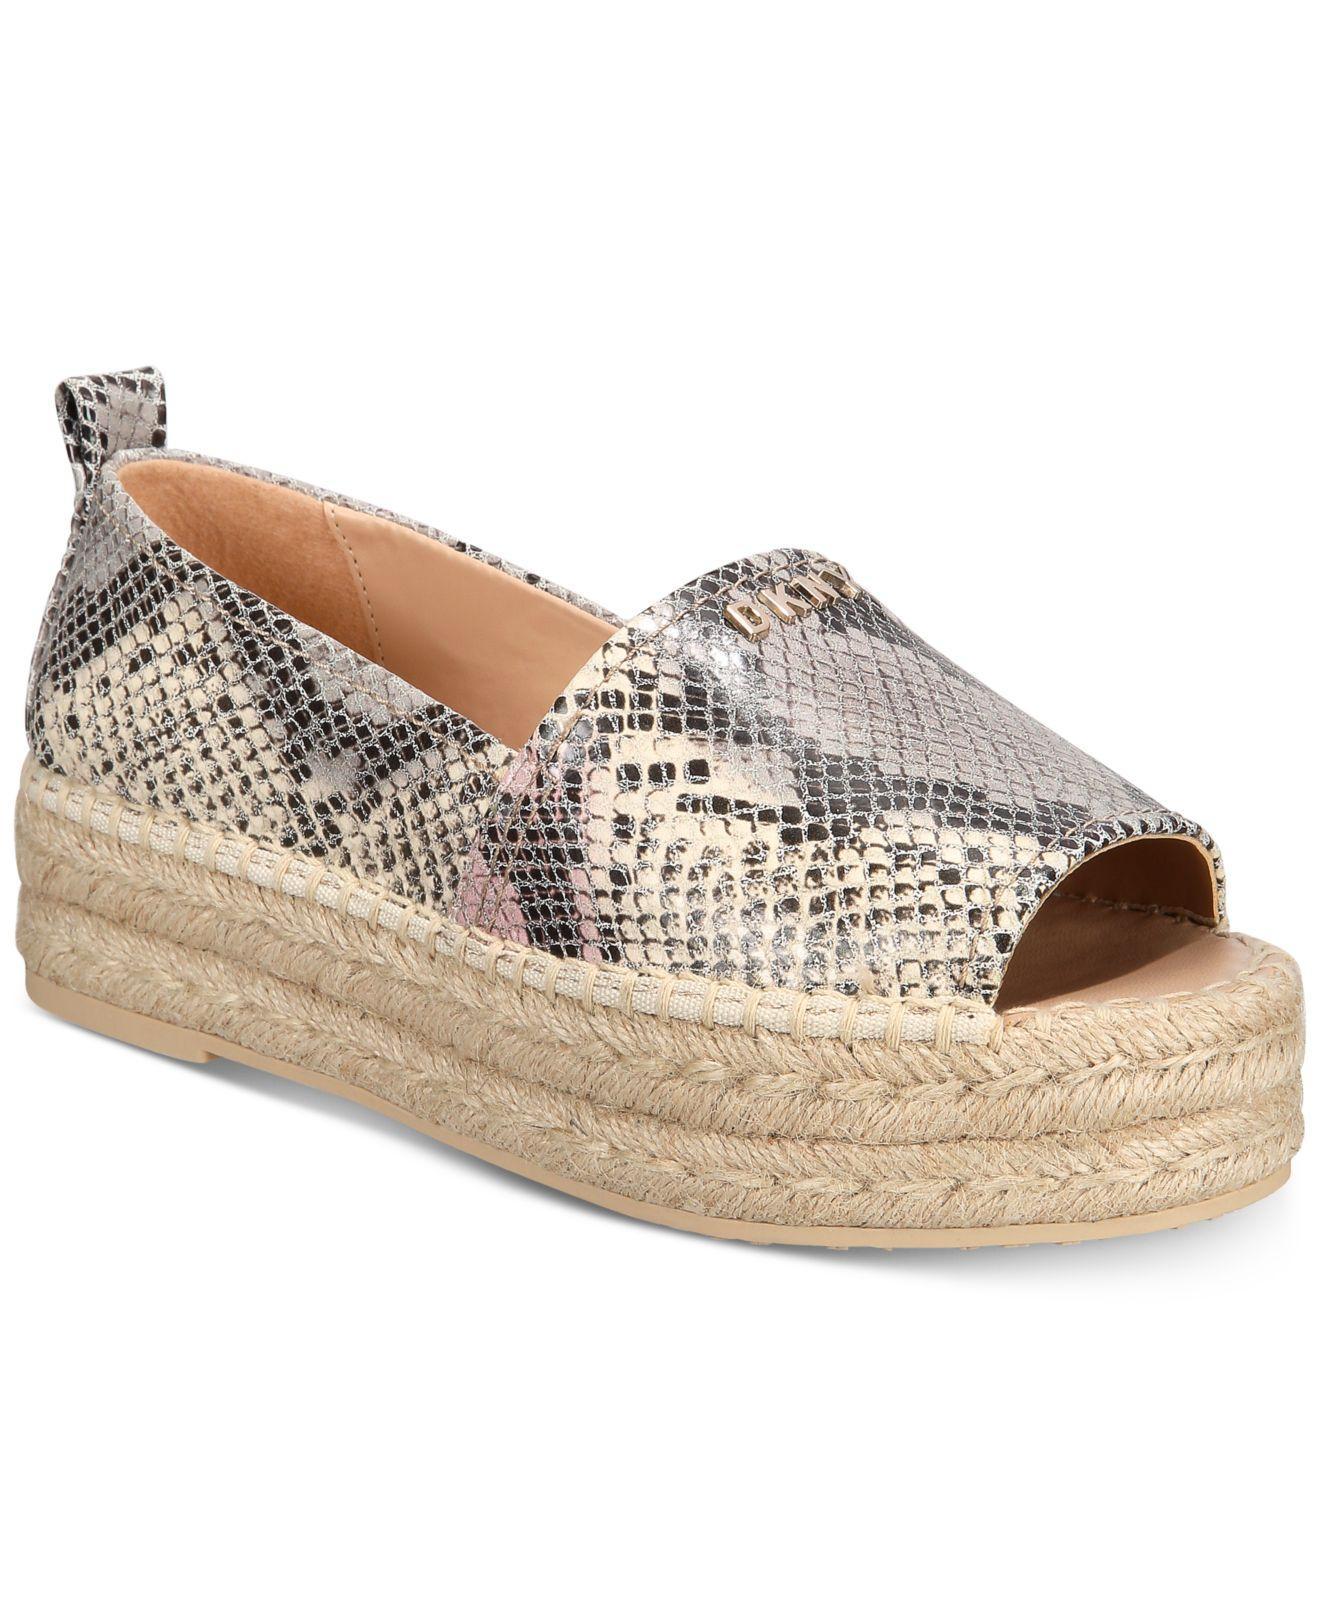 4ca506f5e03 Lyst - DKNY Mer Peep-toe Espadrille Sandals